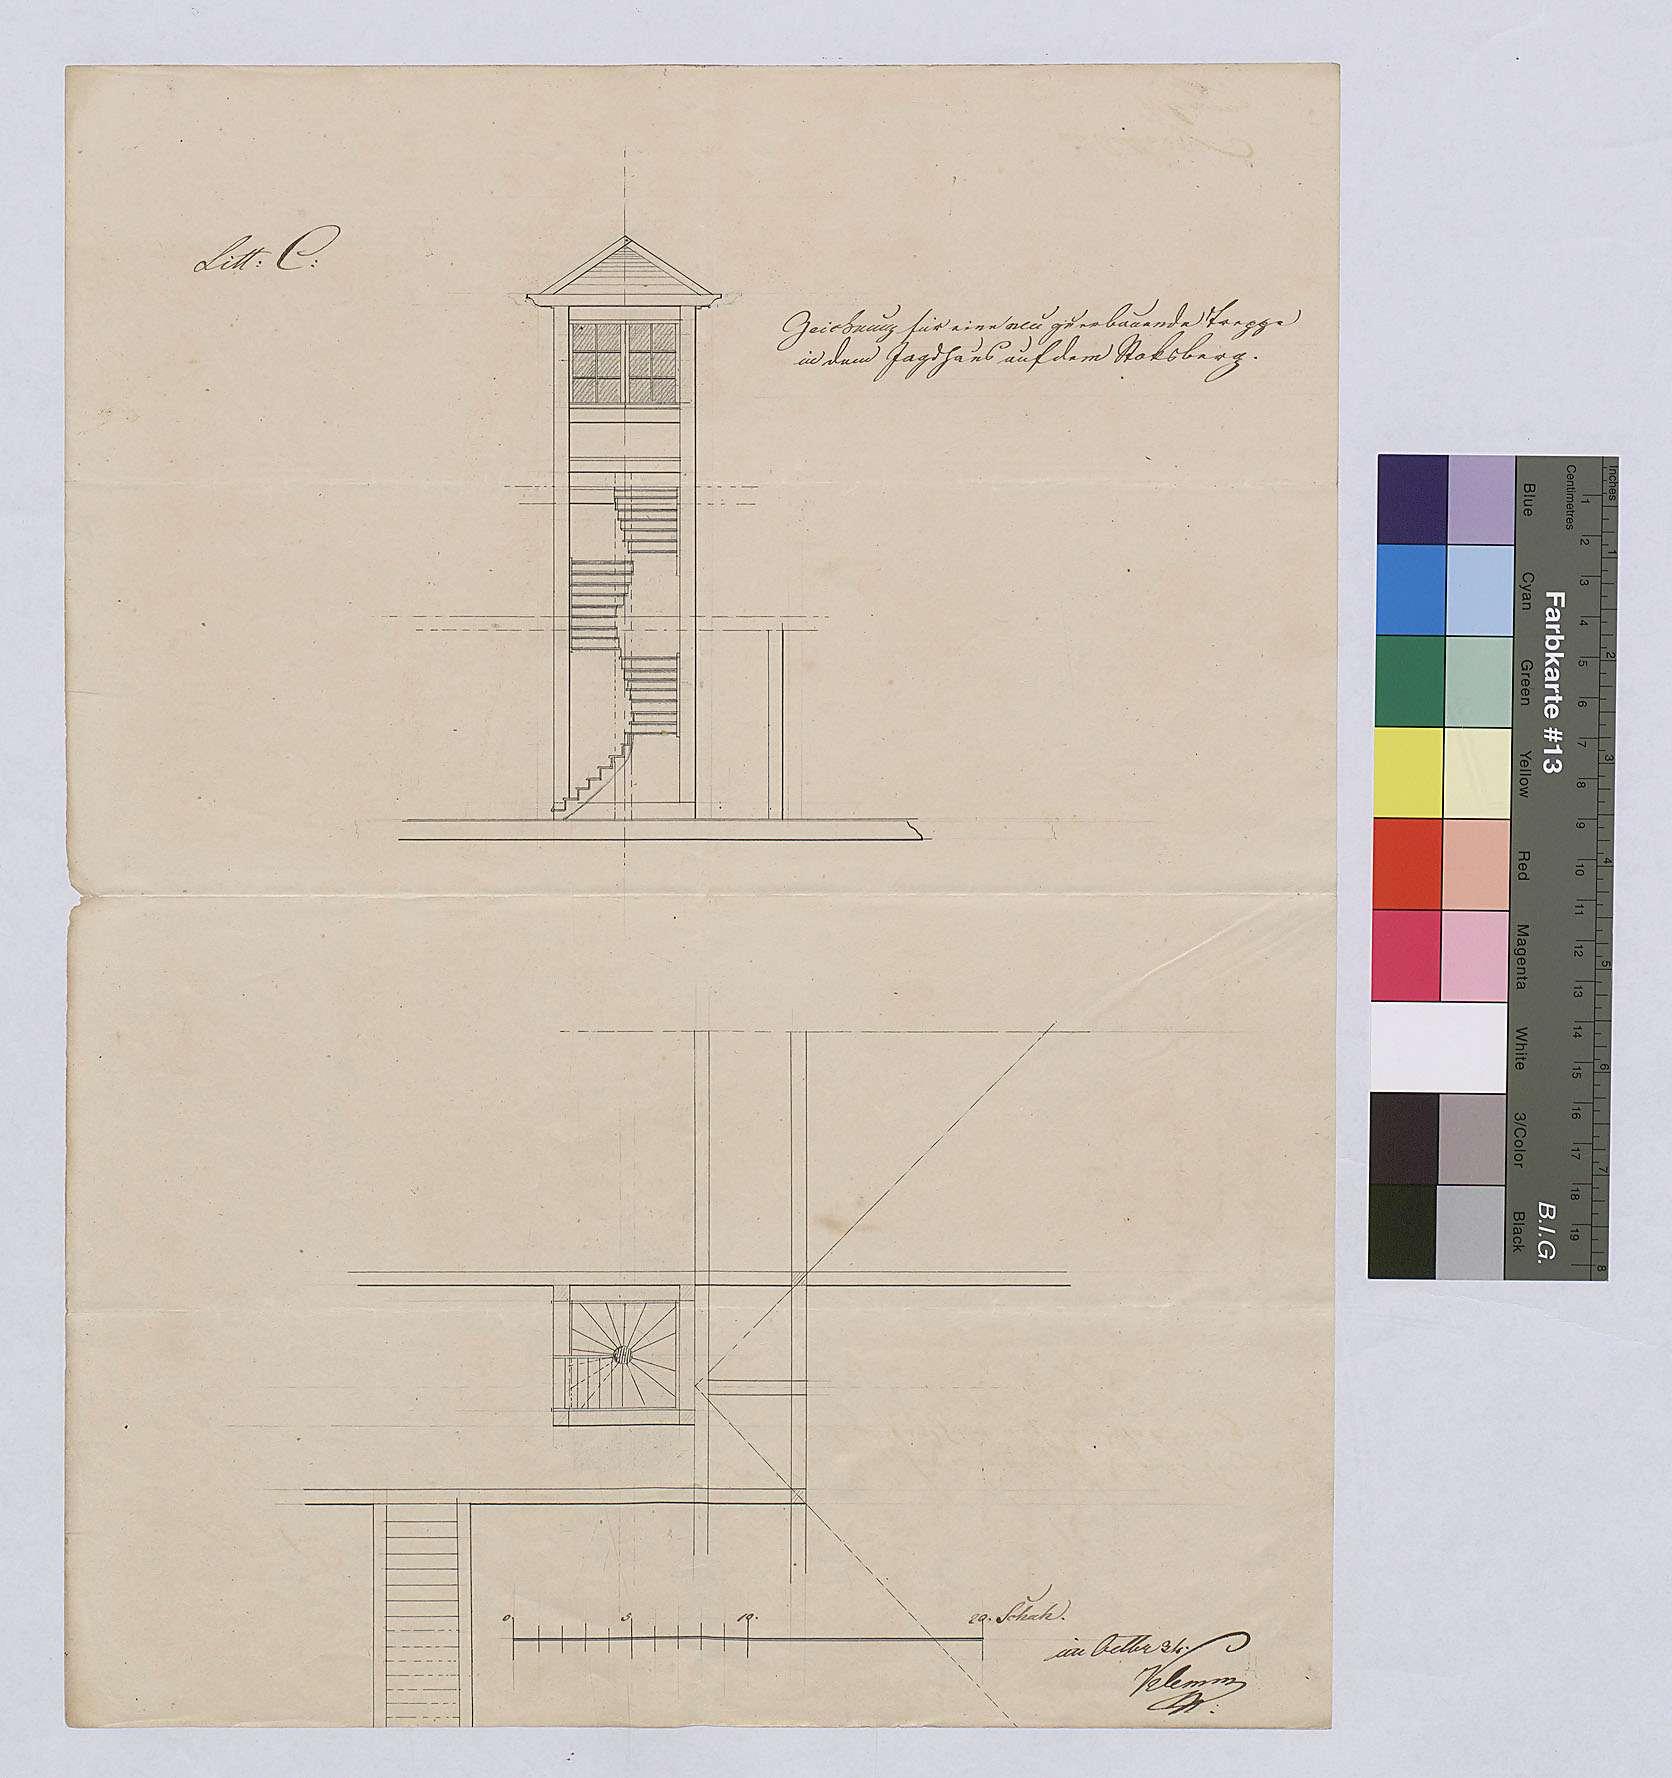 Jagdhaus Stocksberg: Neubau einer Treppe, Bild 1